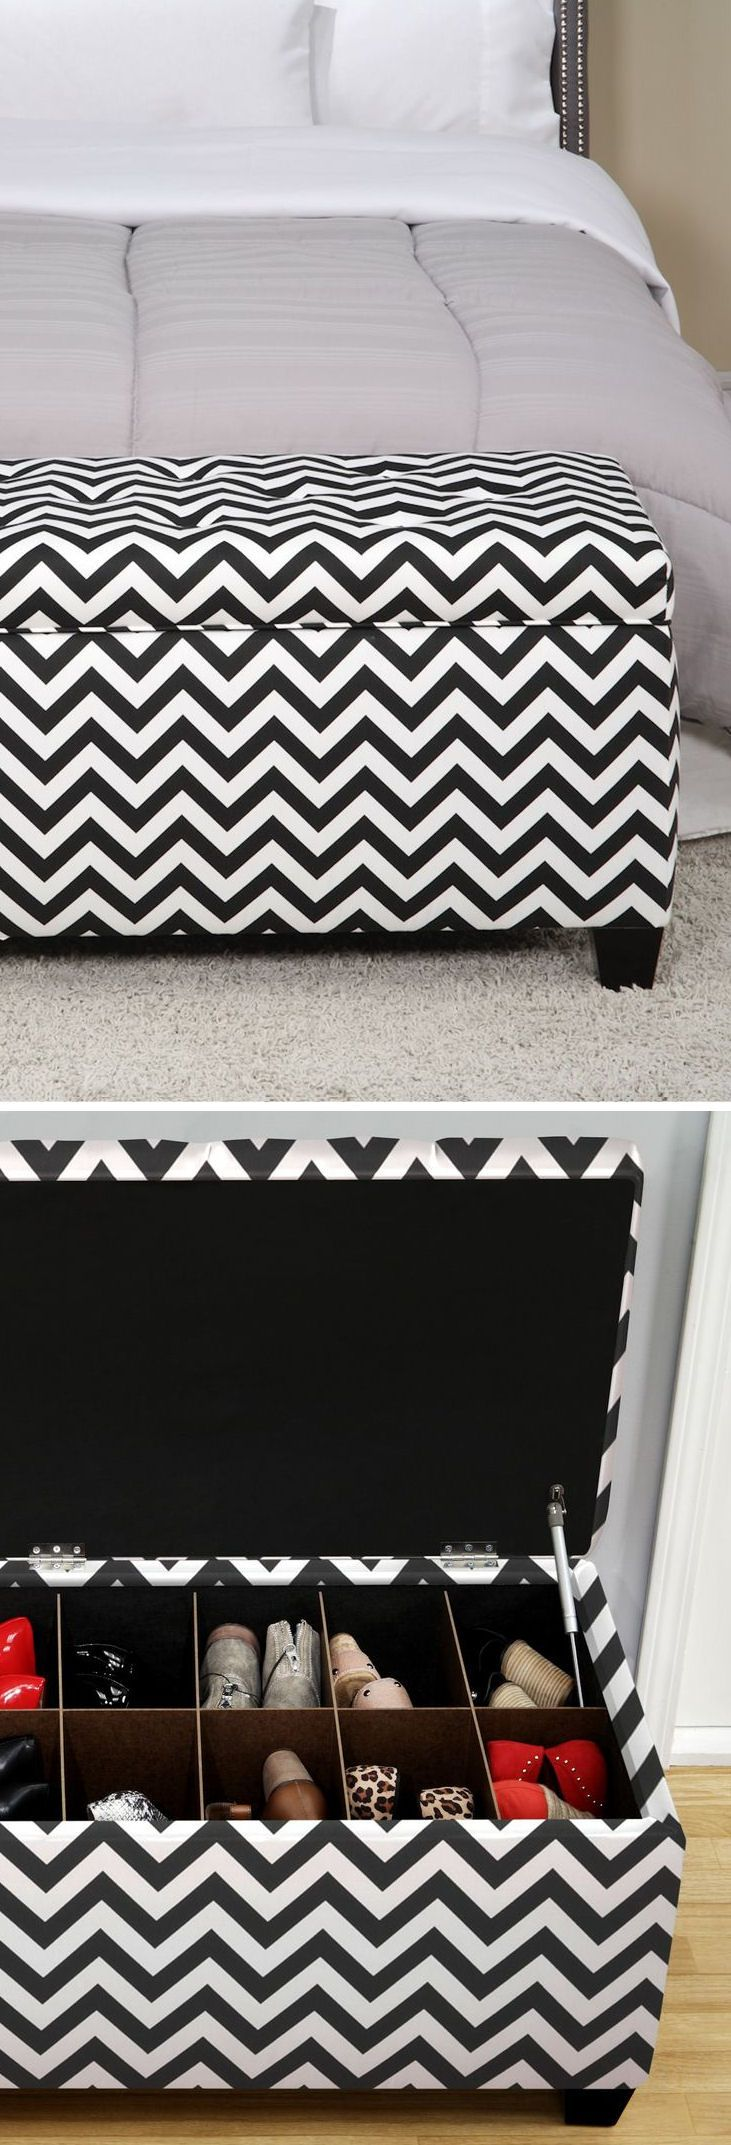 Chevron Upholstered Shoe Storage Bench // Black & White